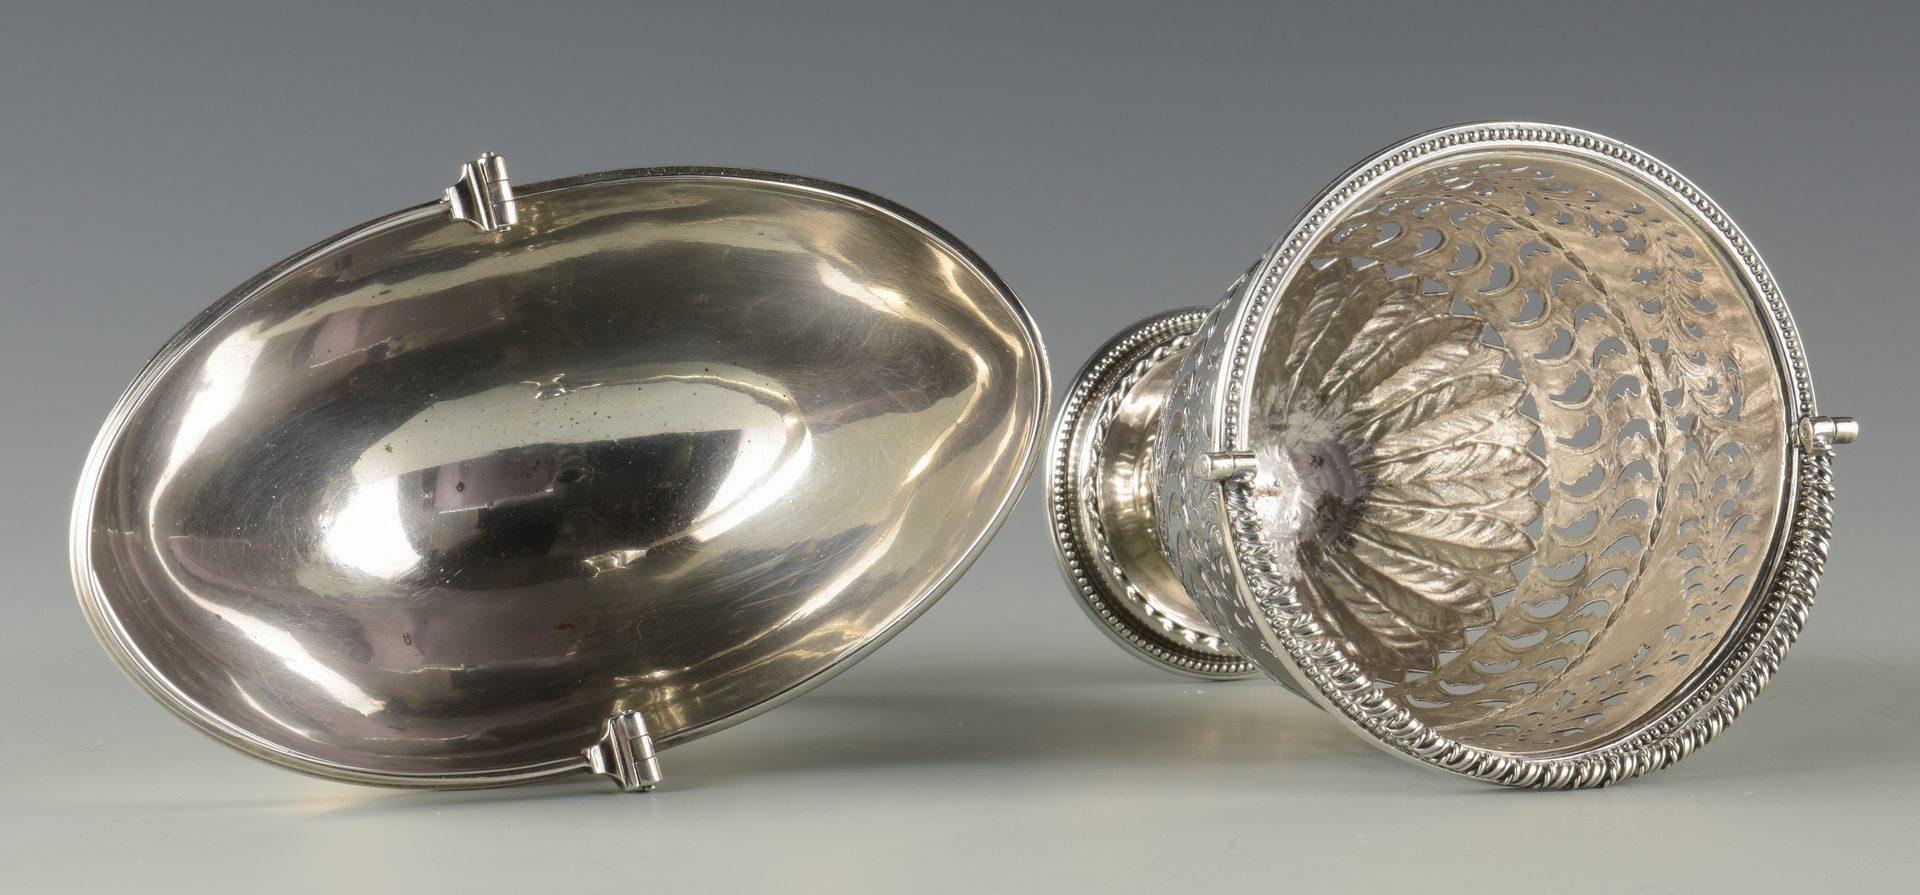 Lot 354: 2 Silver Baskets inc. Early Tiffany